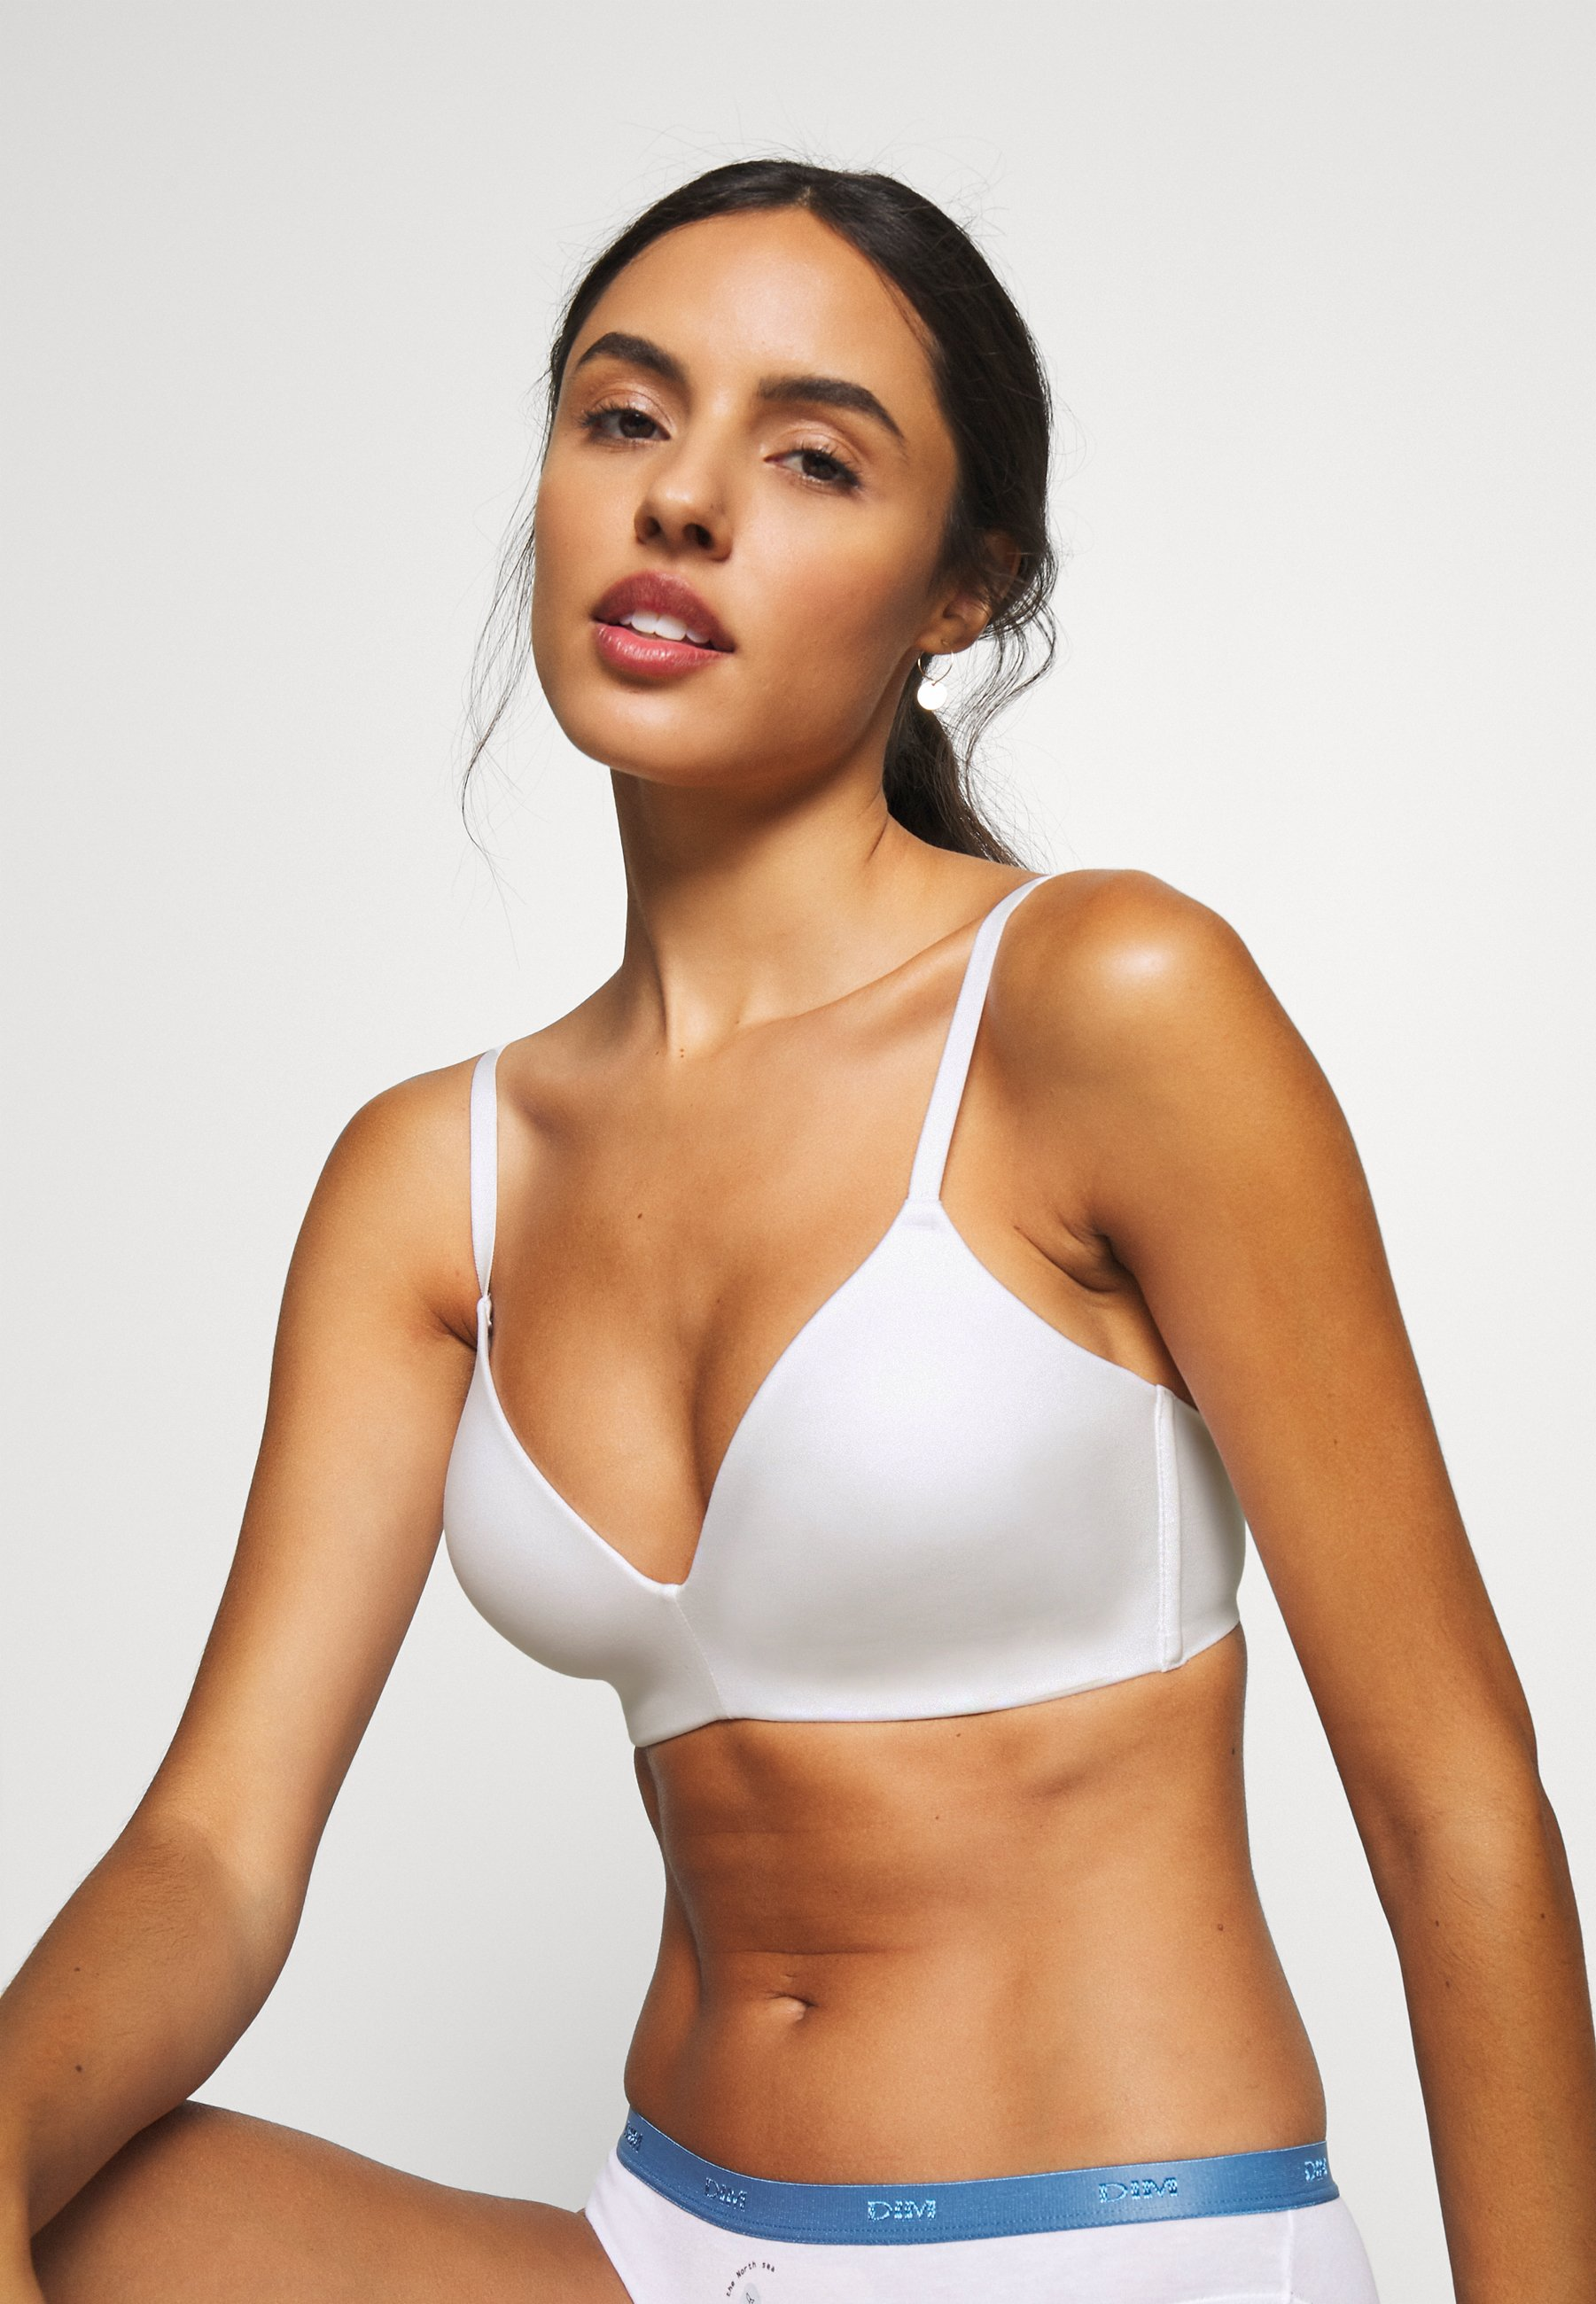 Women GEPADDET - T-shirt bra